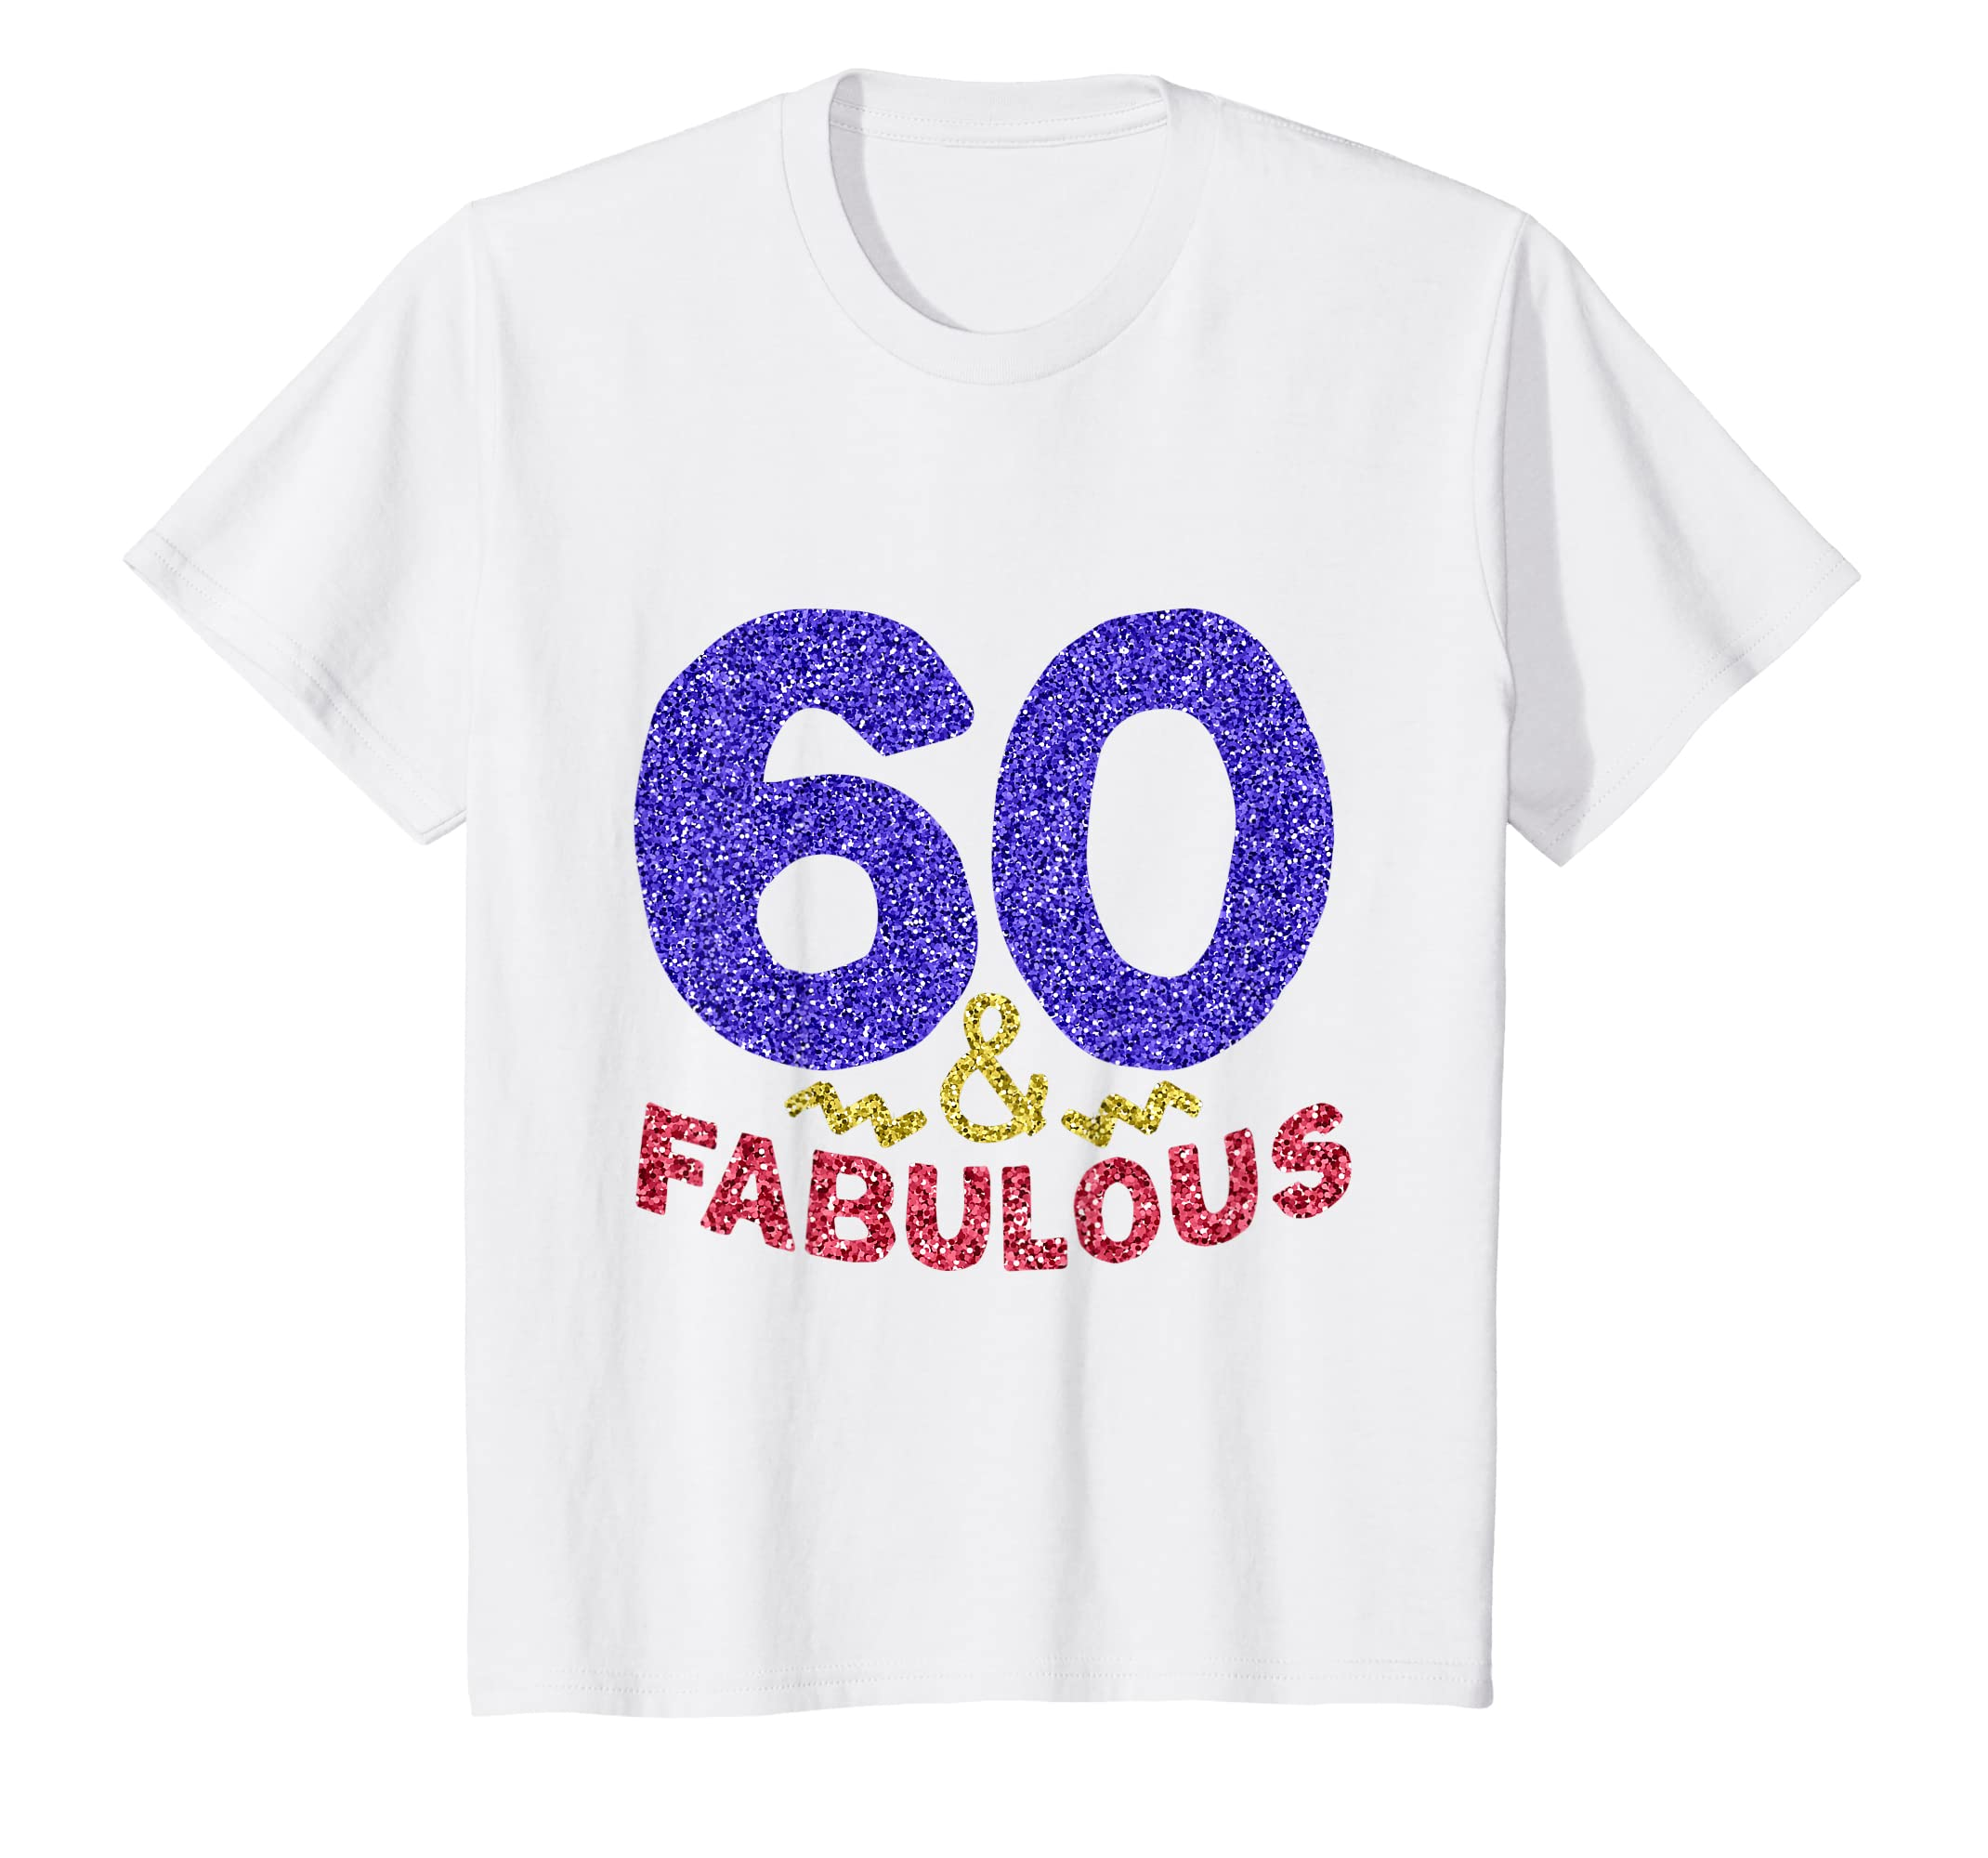 Amazon 60th Birthday Shirt For Women Grandma Funny 60 Year Old Gift Clothing